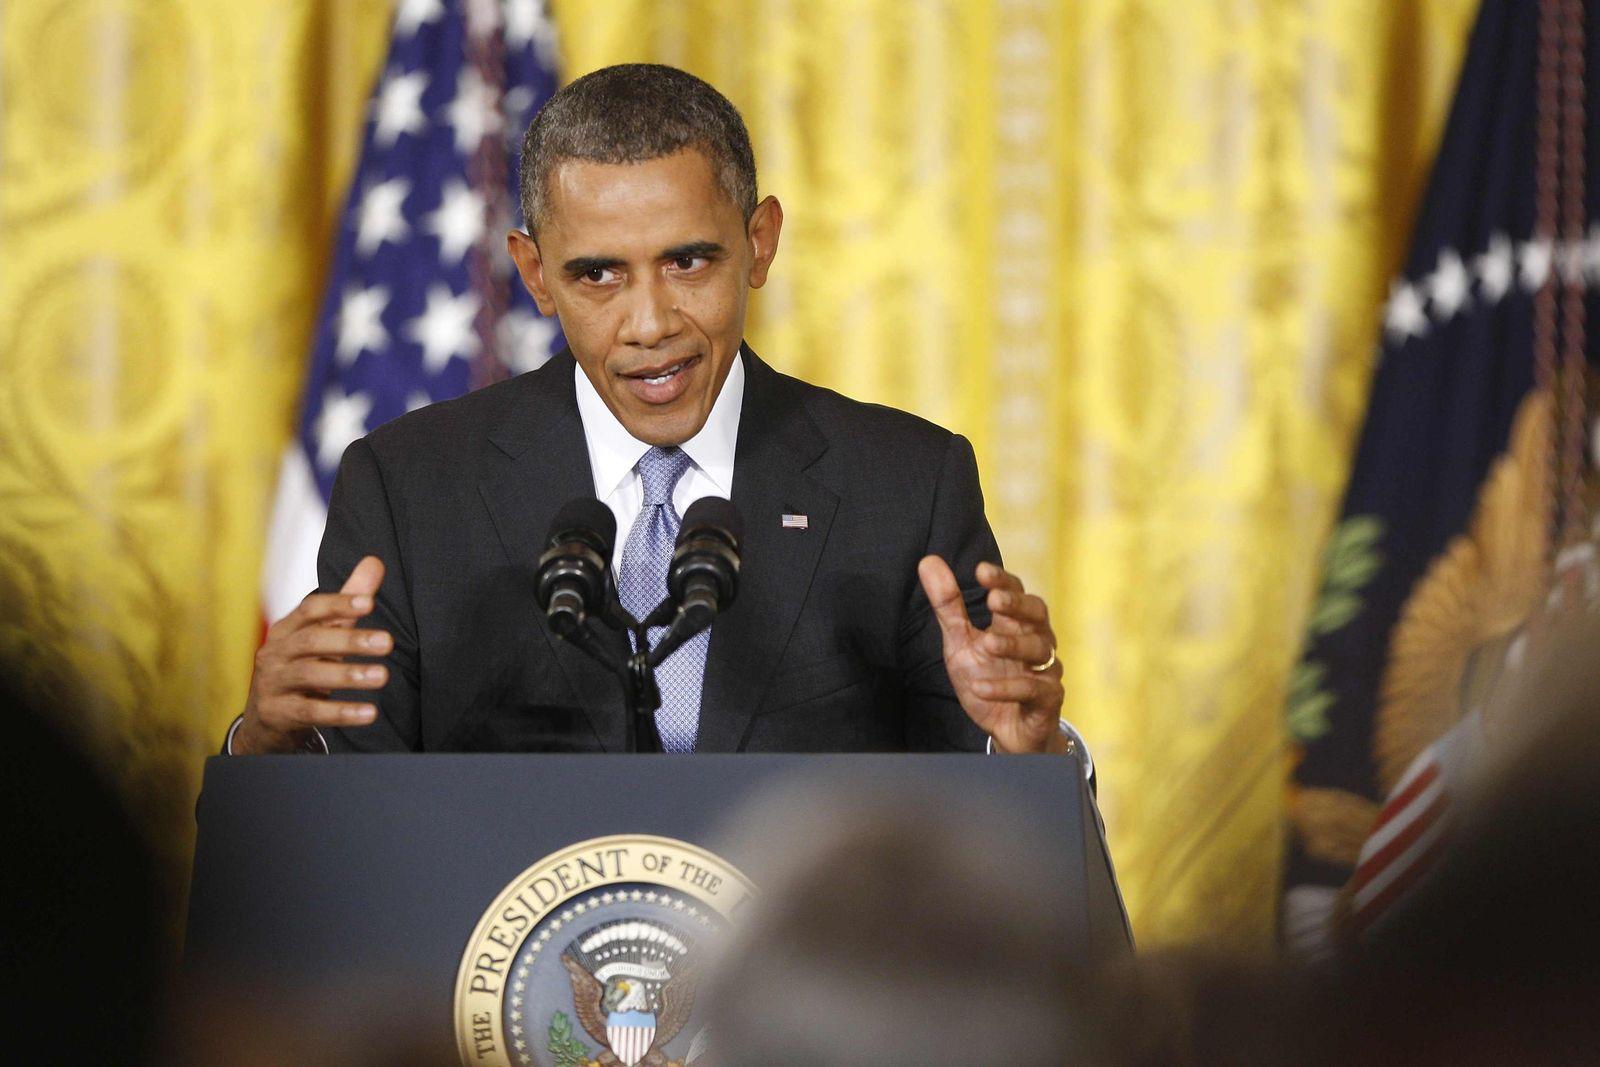 USA-OBAMA/SURVEILLANCE Pressekonferenz